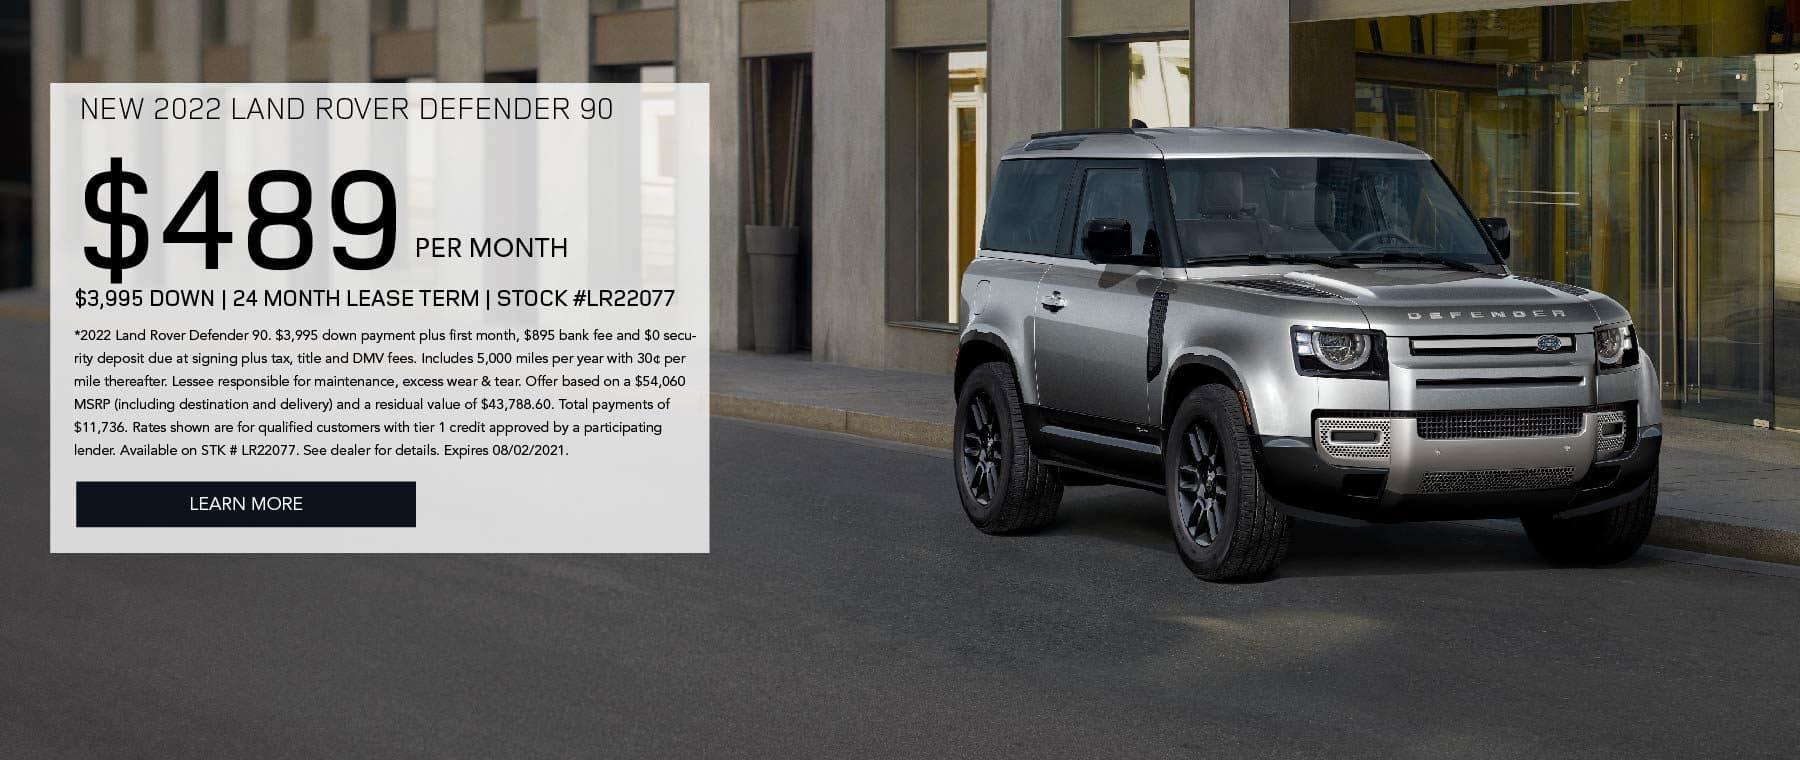 Land Rover Manhattan_July New 2022 Defender